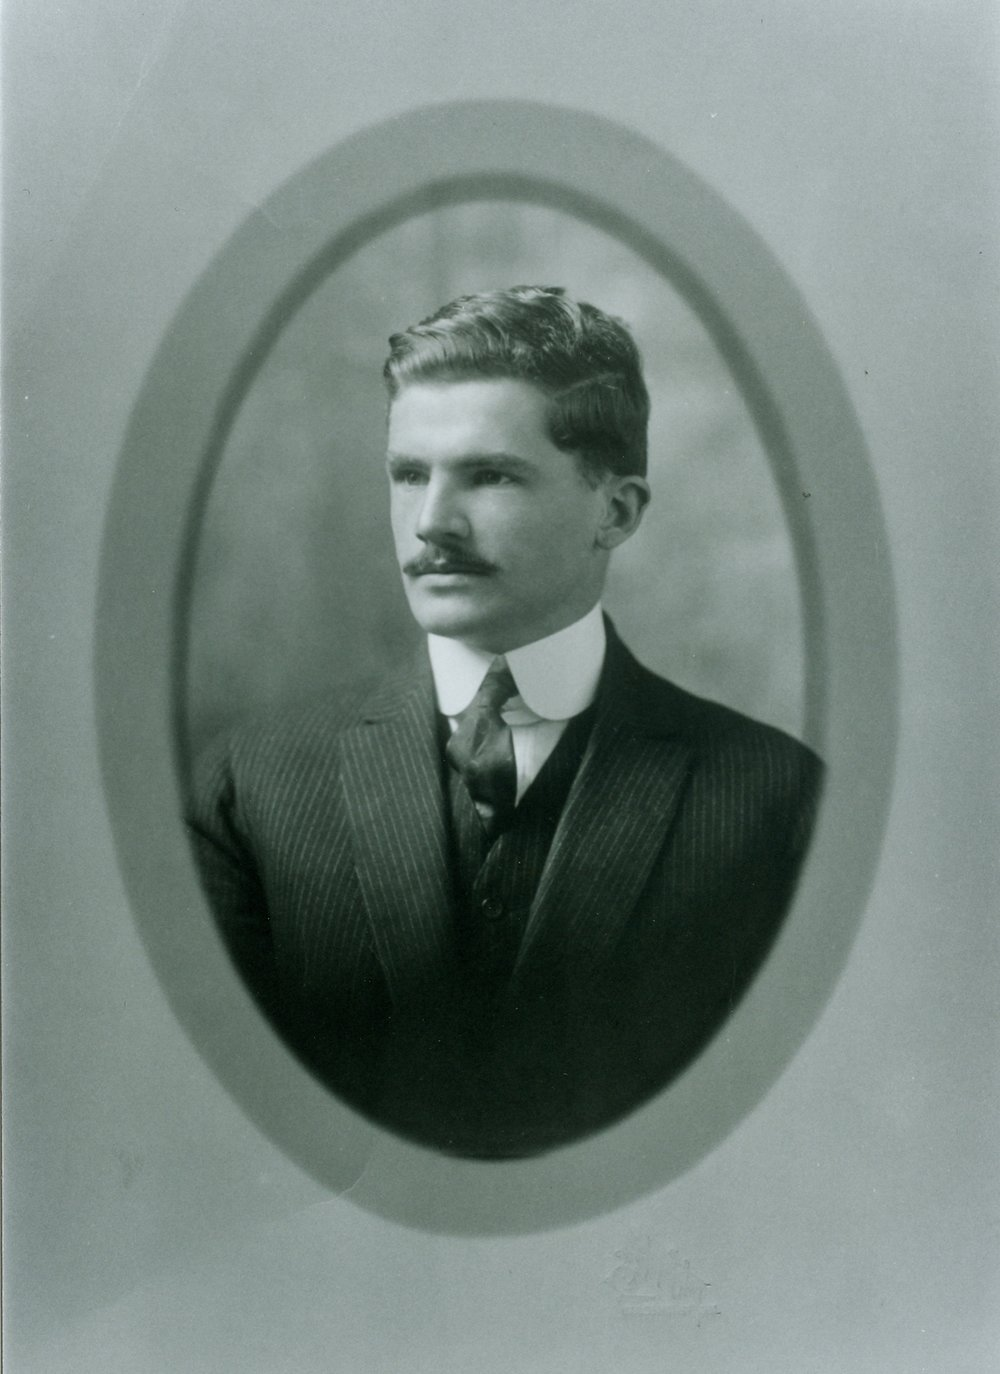 Arthur J. Shannon 1895-1938